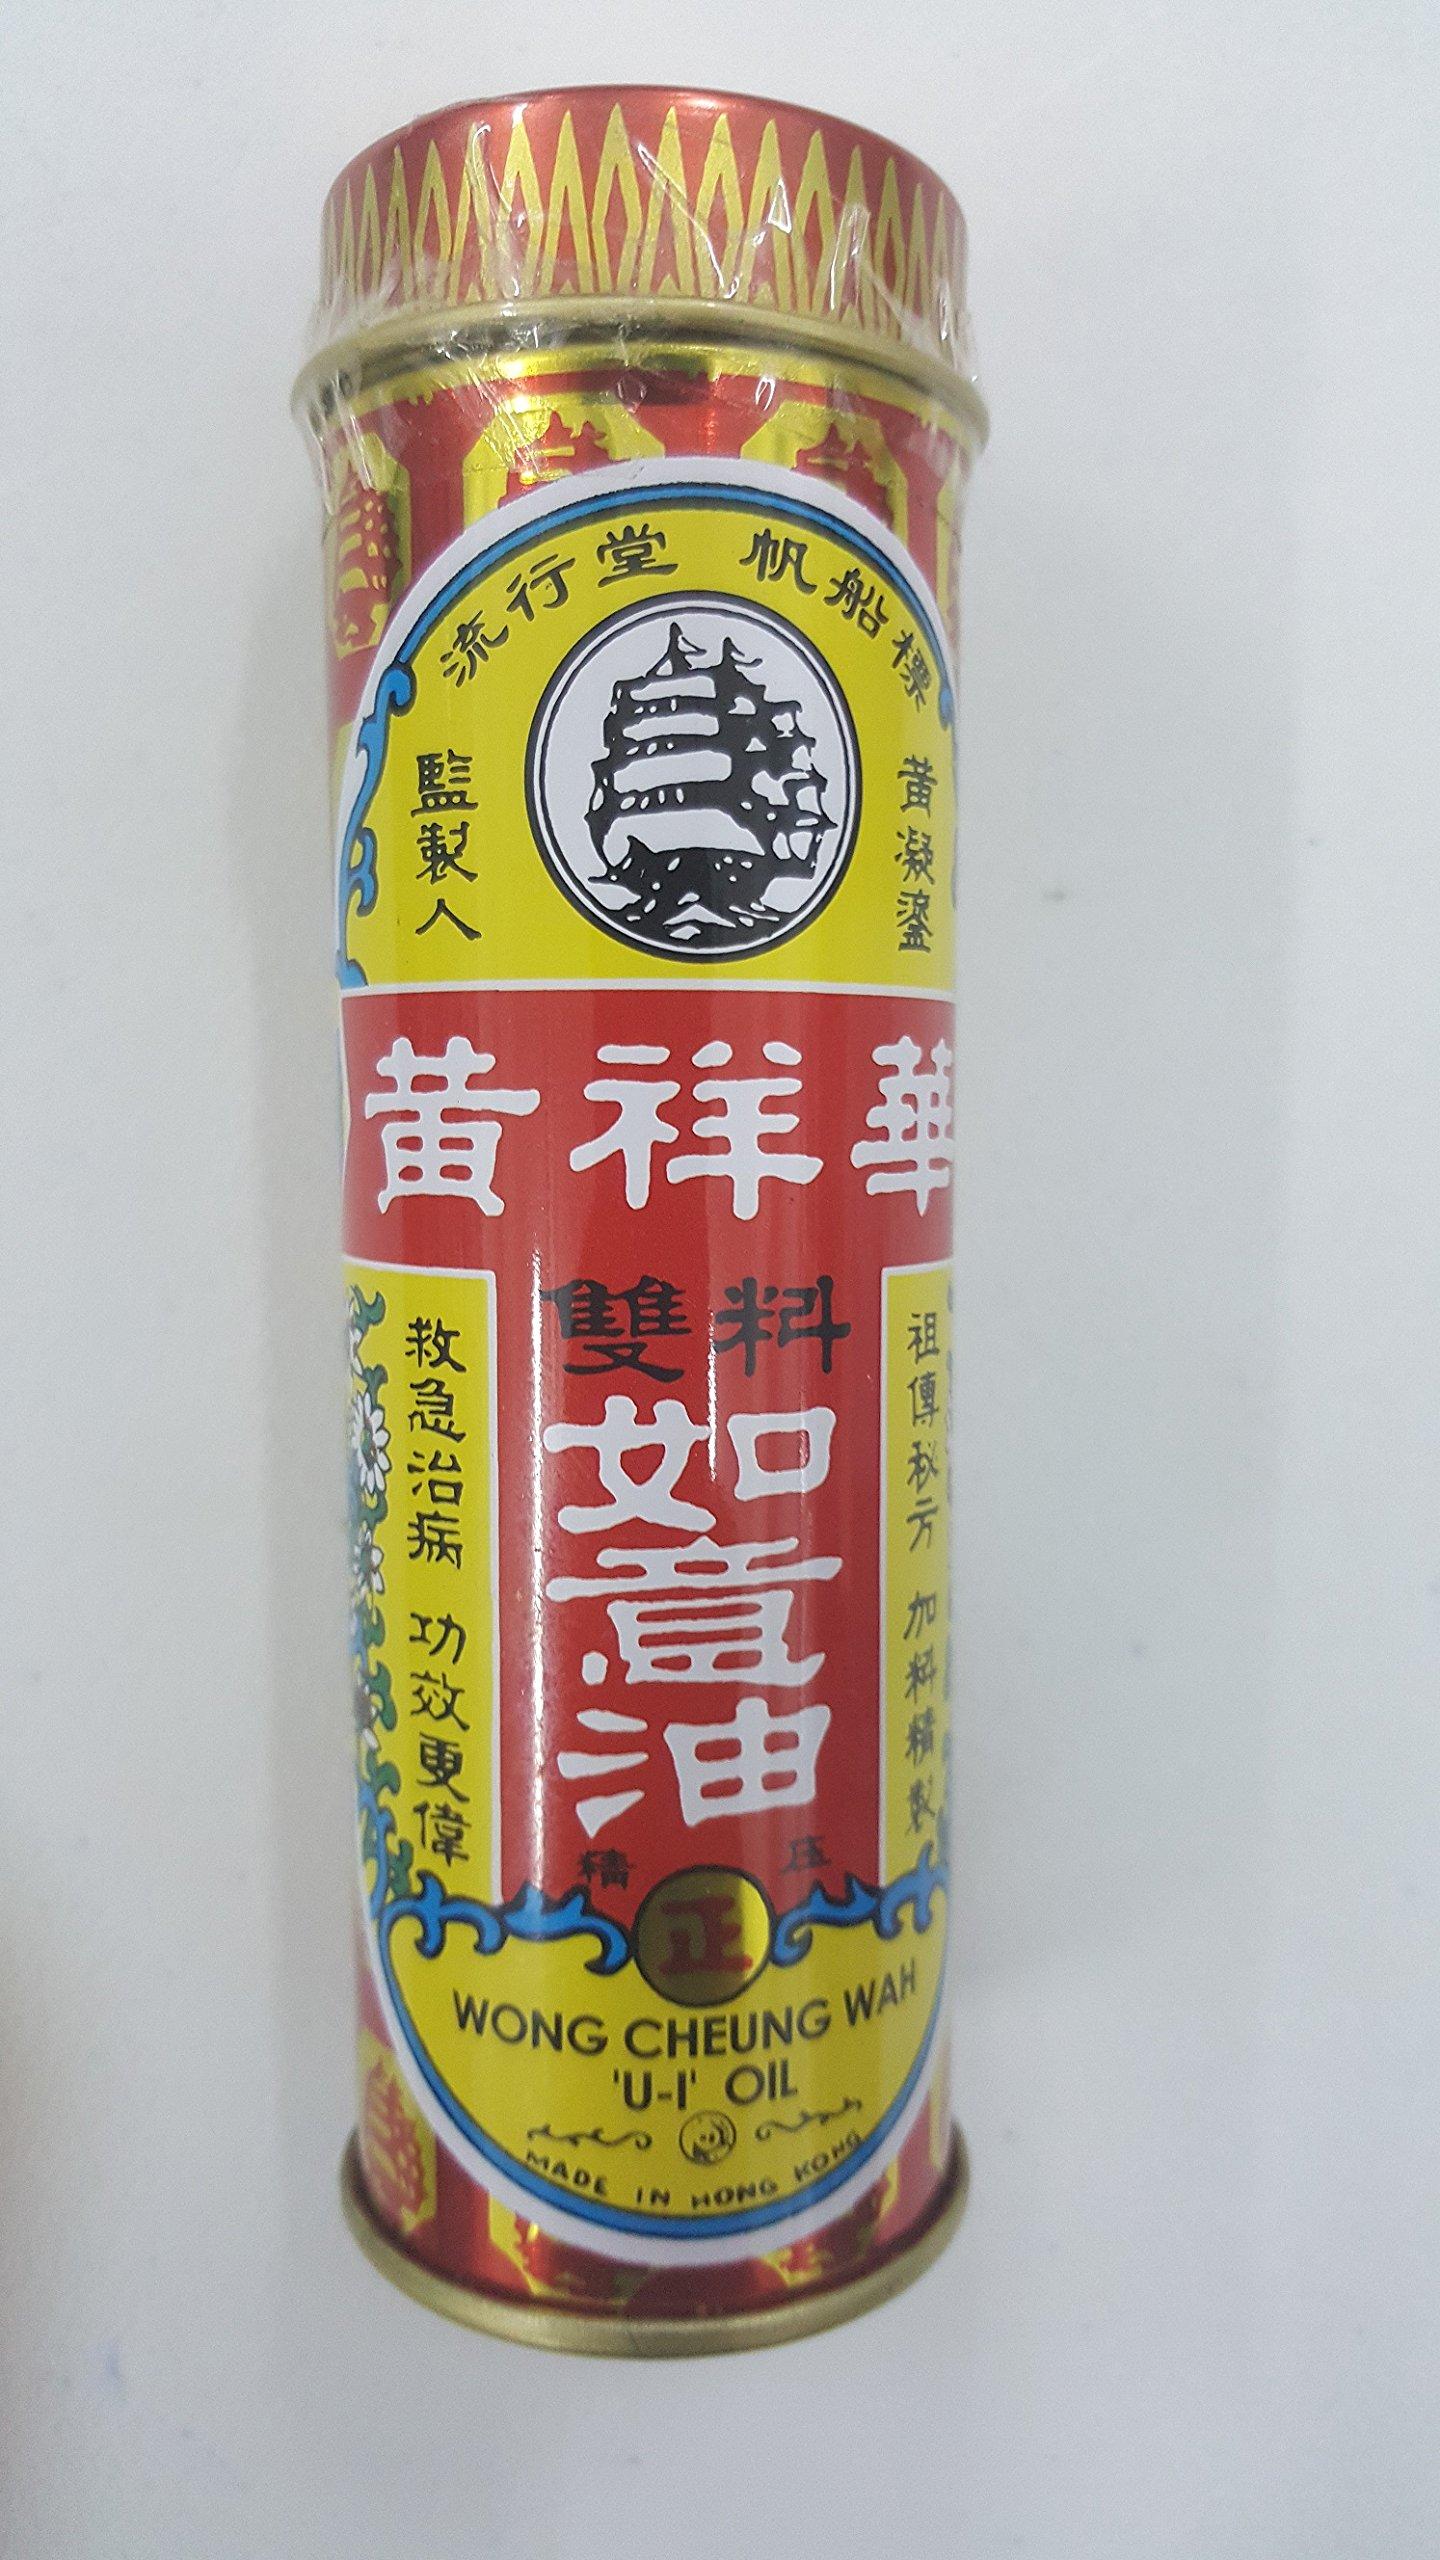 Wong Cheung Wah Brand U-I-Oil 12.5 ml Reduce Discomfort Pain Relief 正货万和堂黄祥华如意油